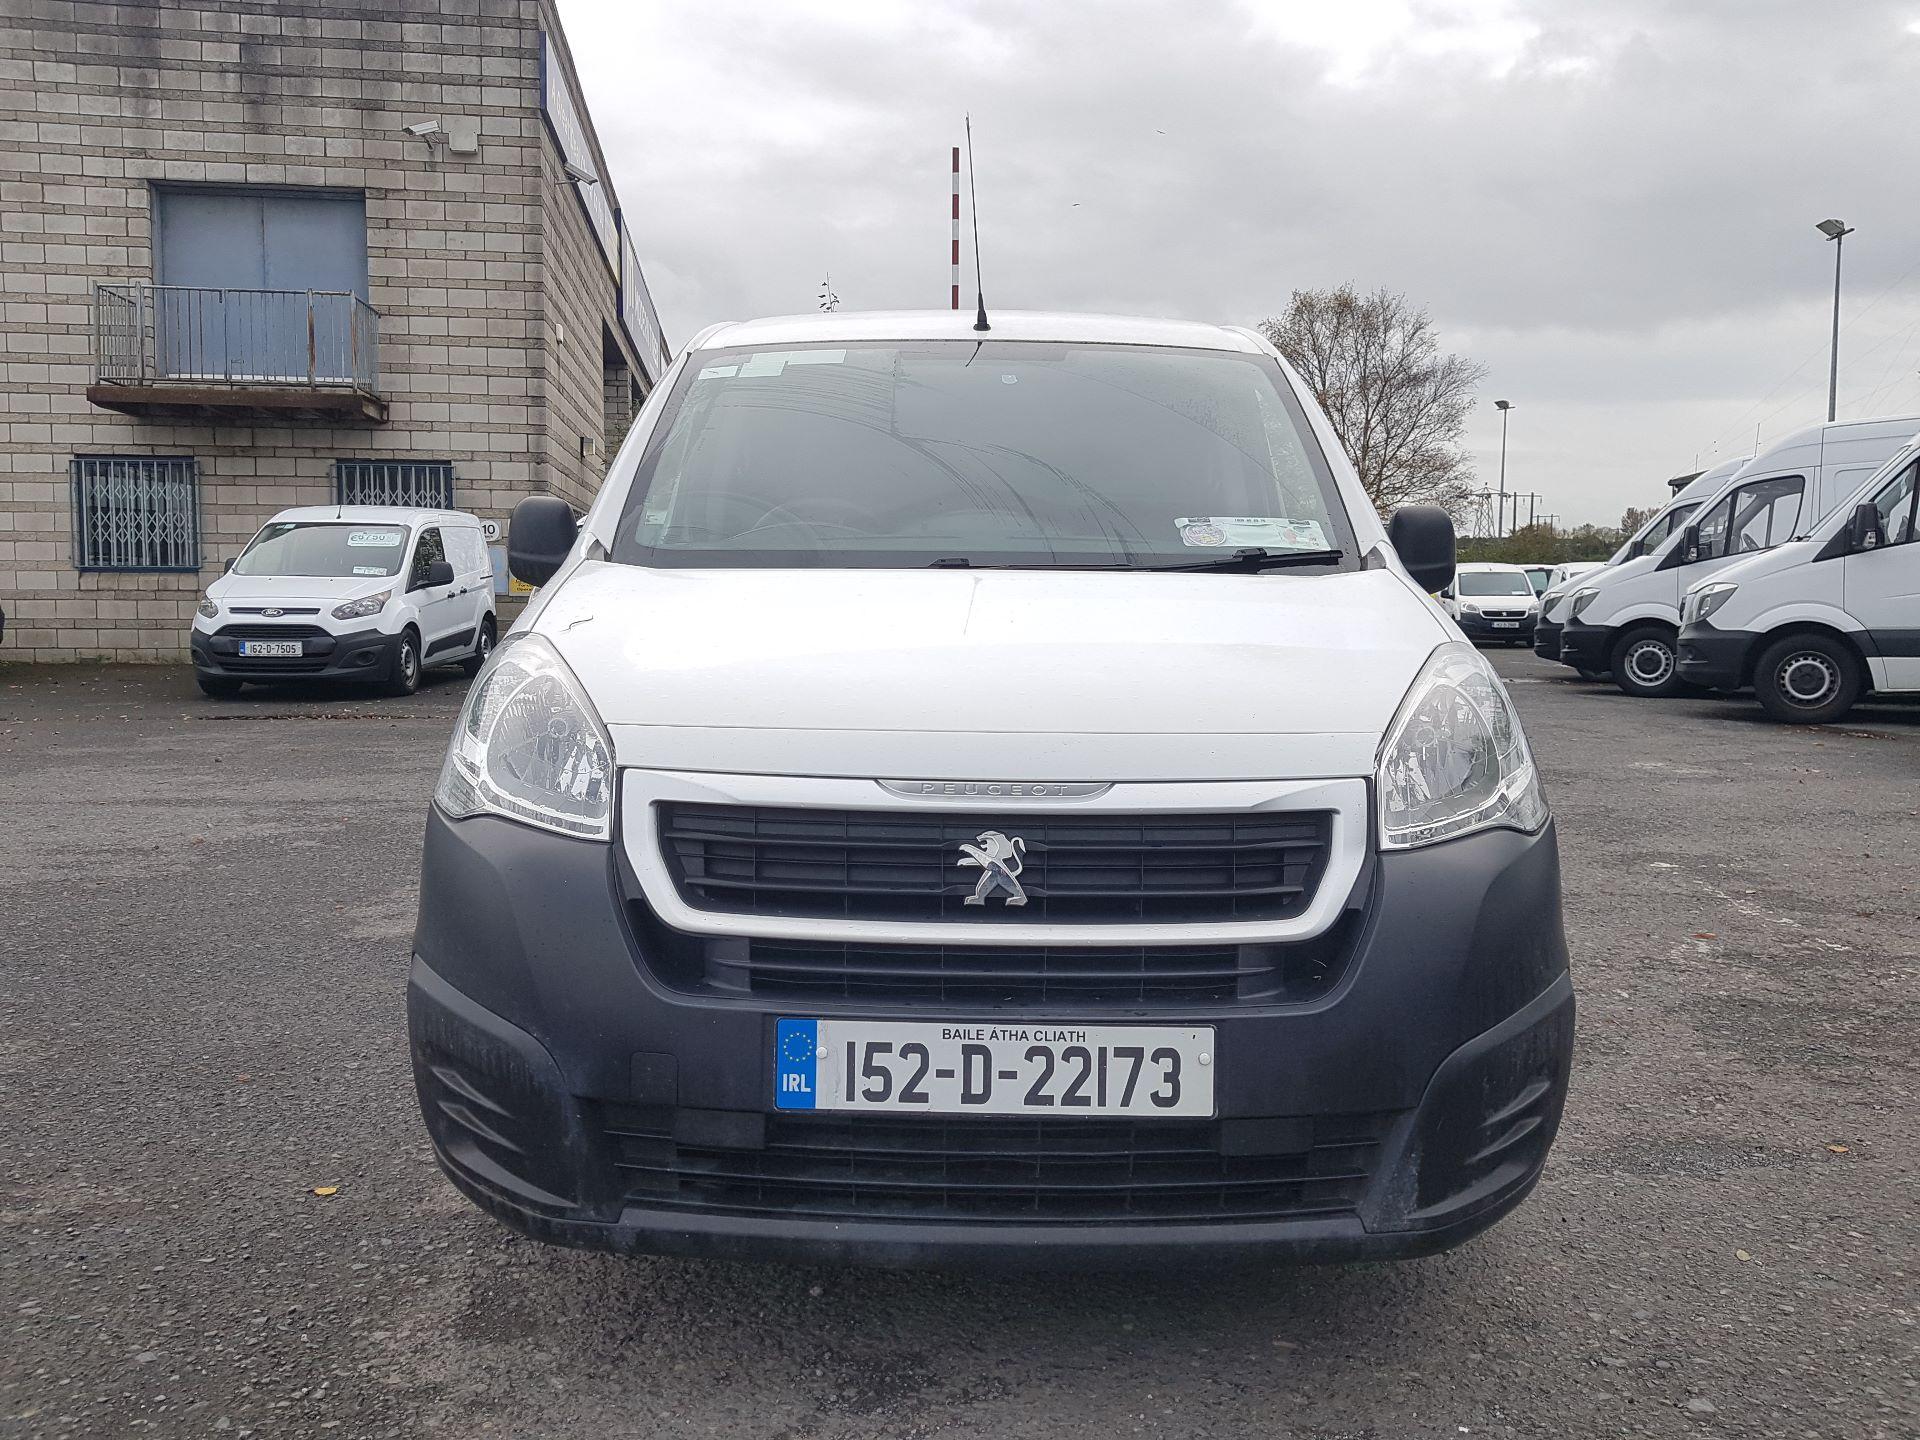 2015 Peugeot Partner Access 1.6 HDI 92 3DR (152D22173)